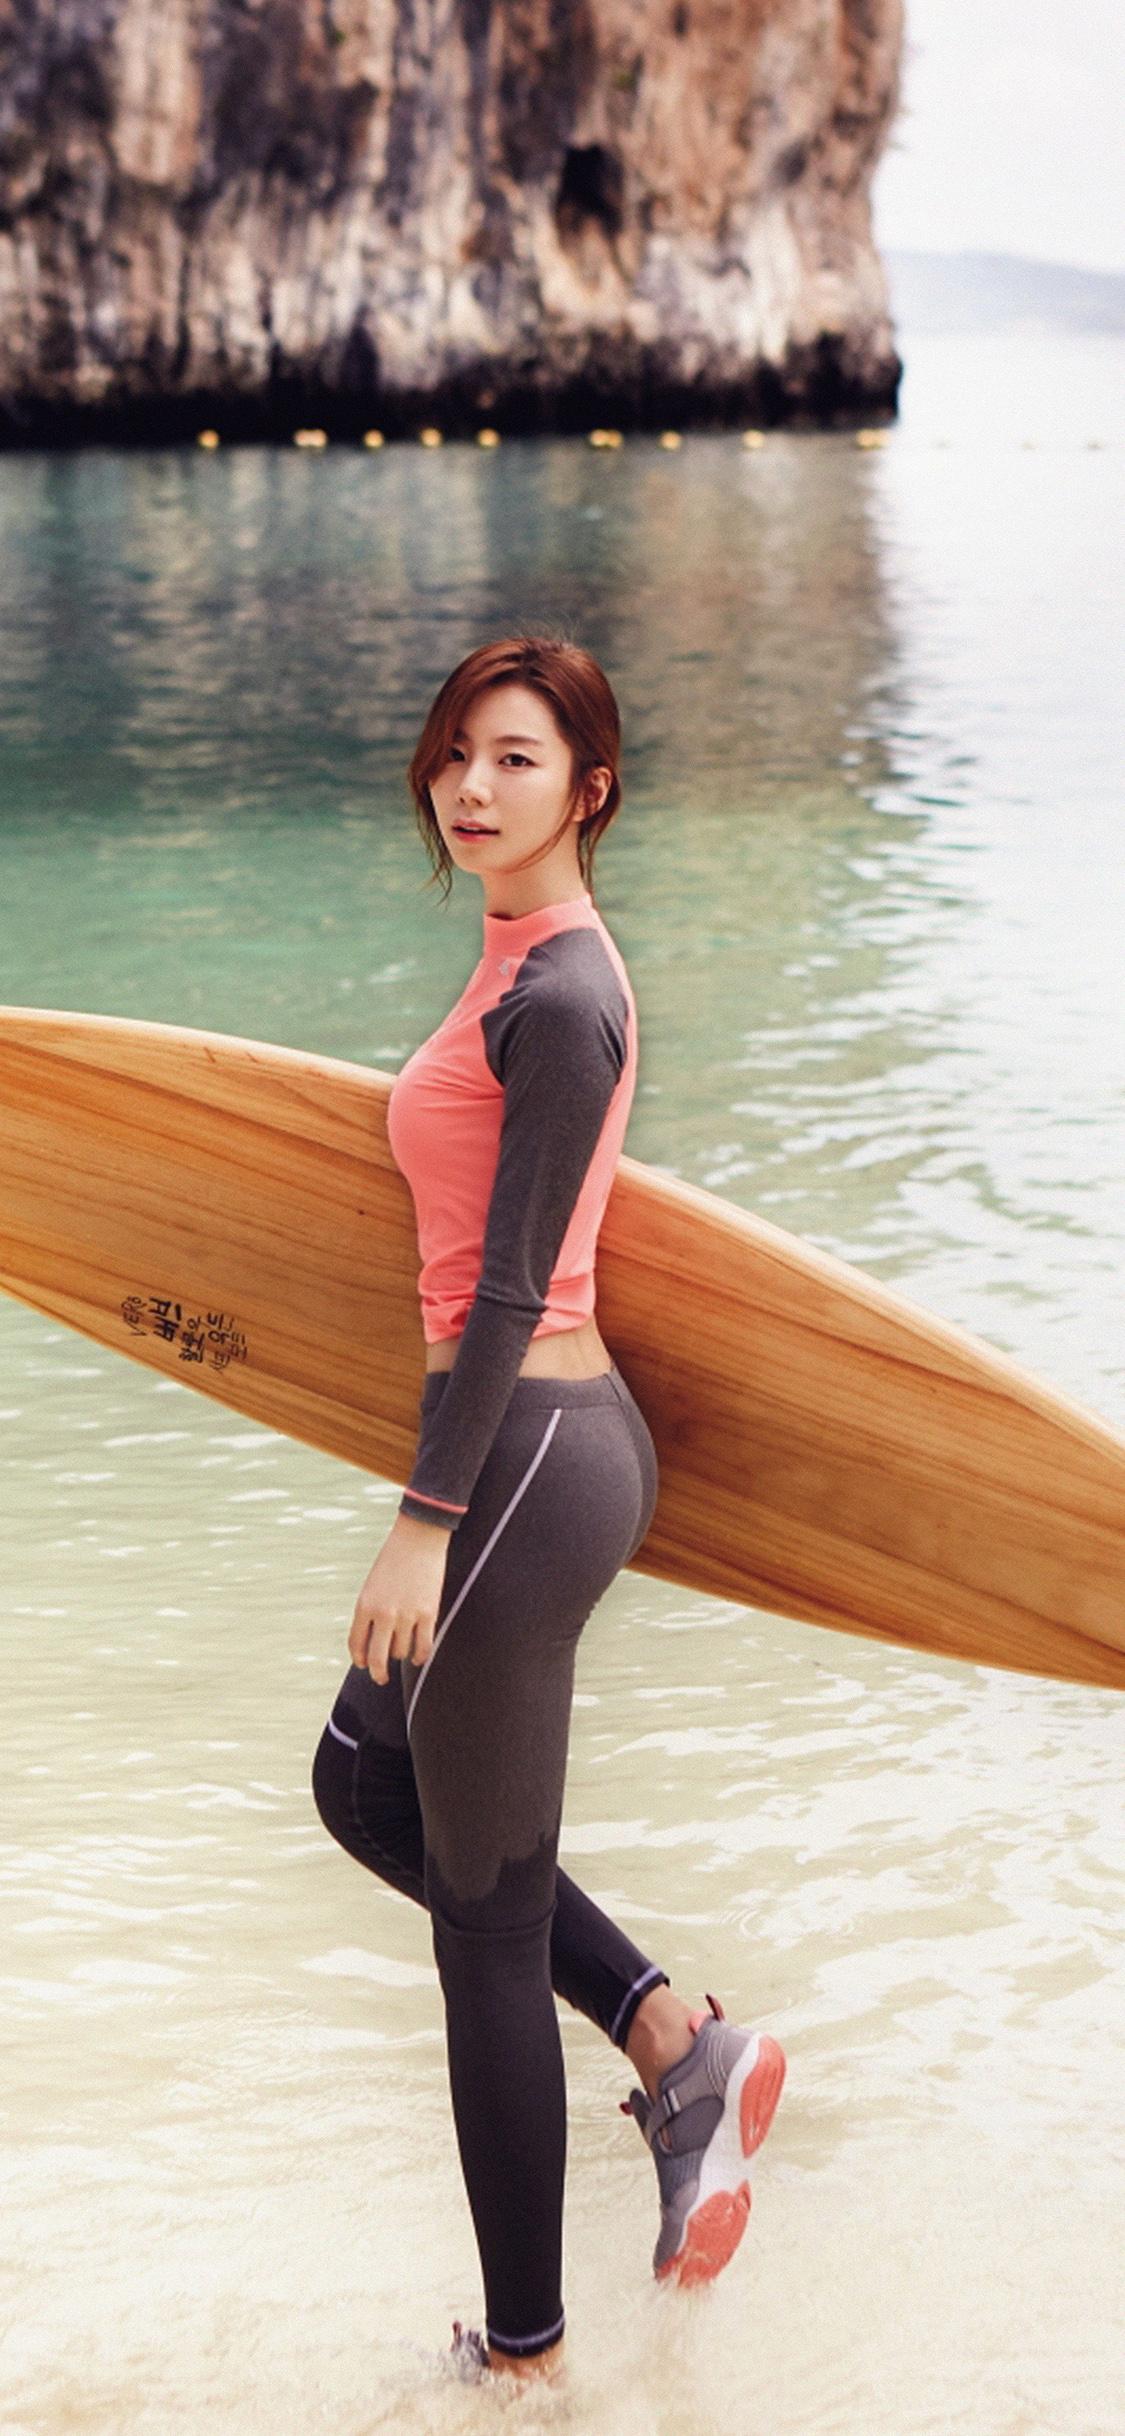 iPhoneXpapers.com-Apple-iPhone-wallpaper-hi12-sujin-beach-swim-vacation-kpop-film